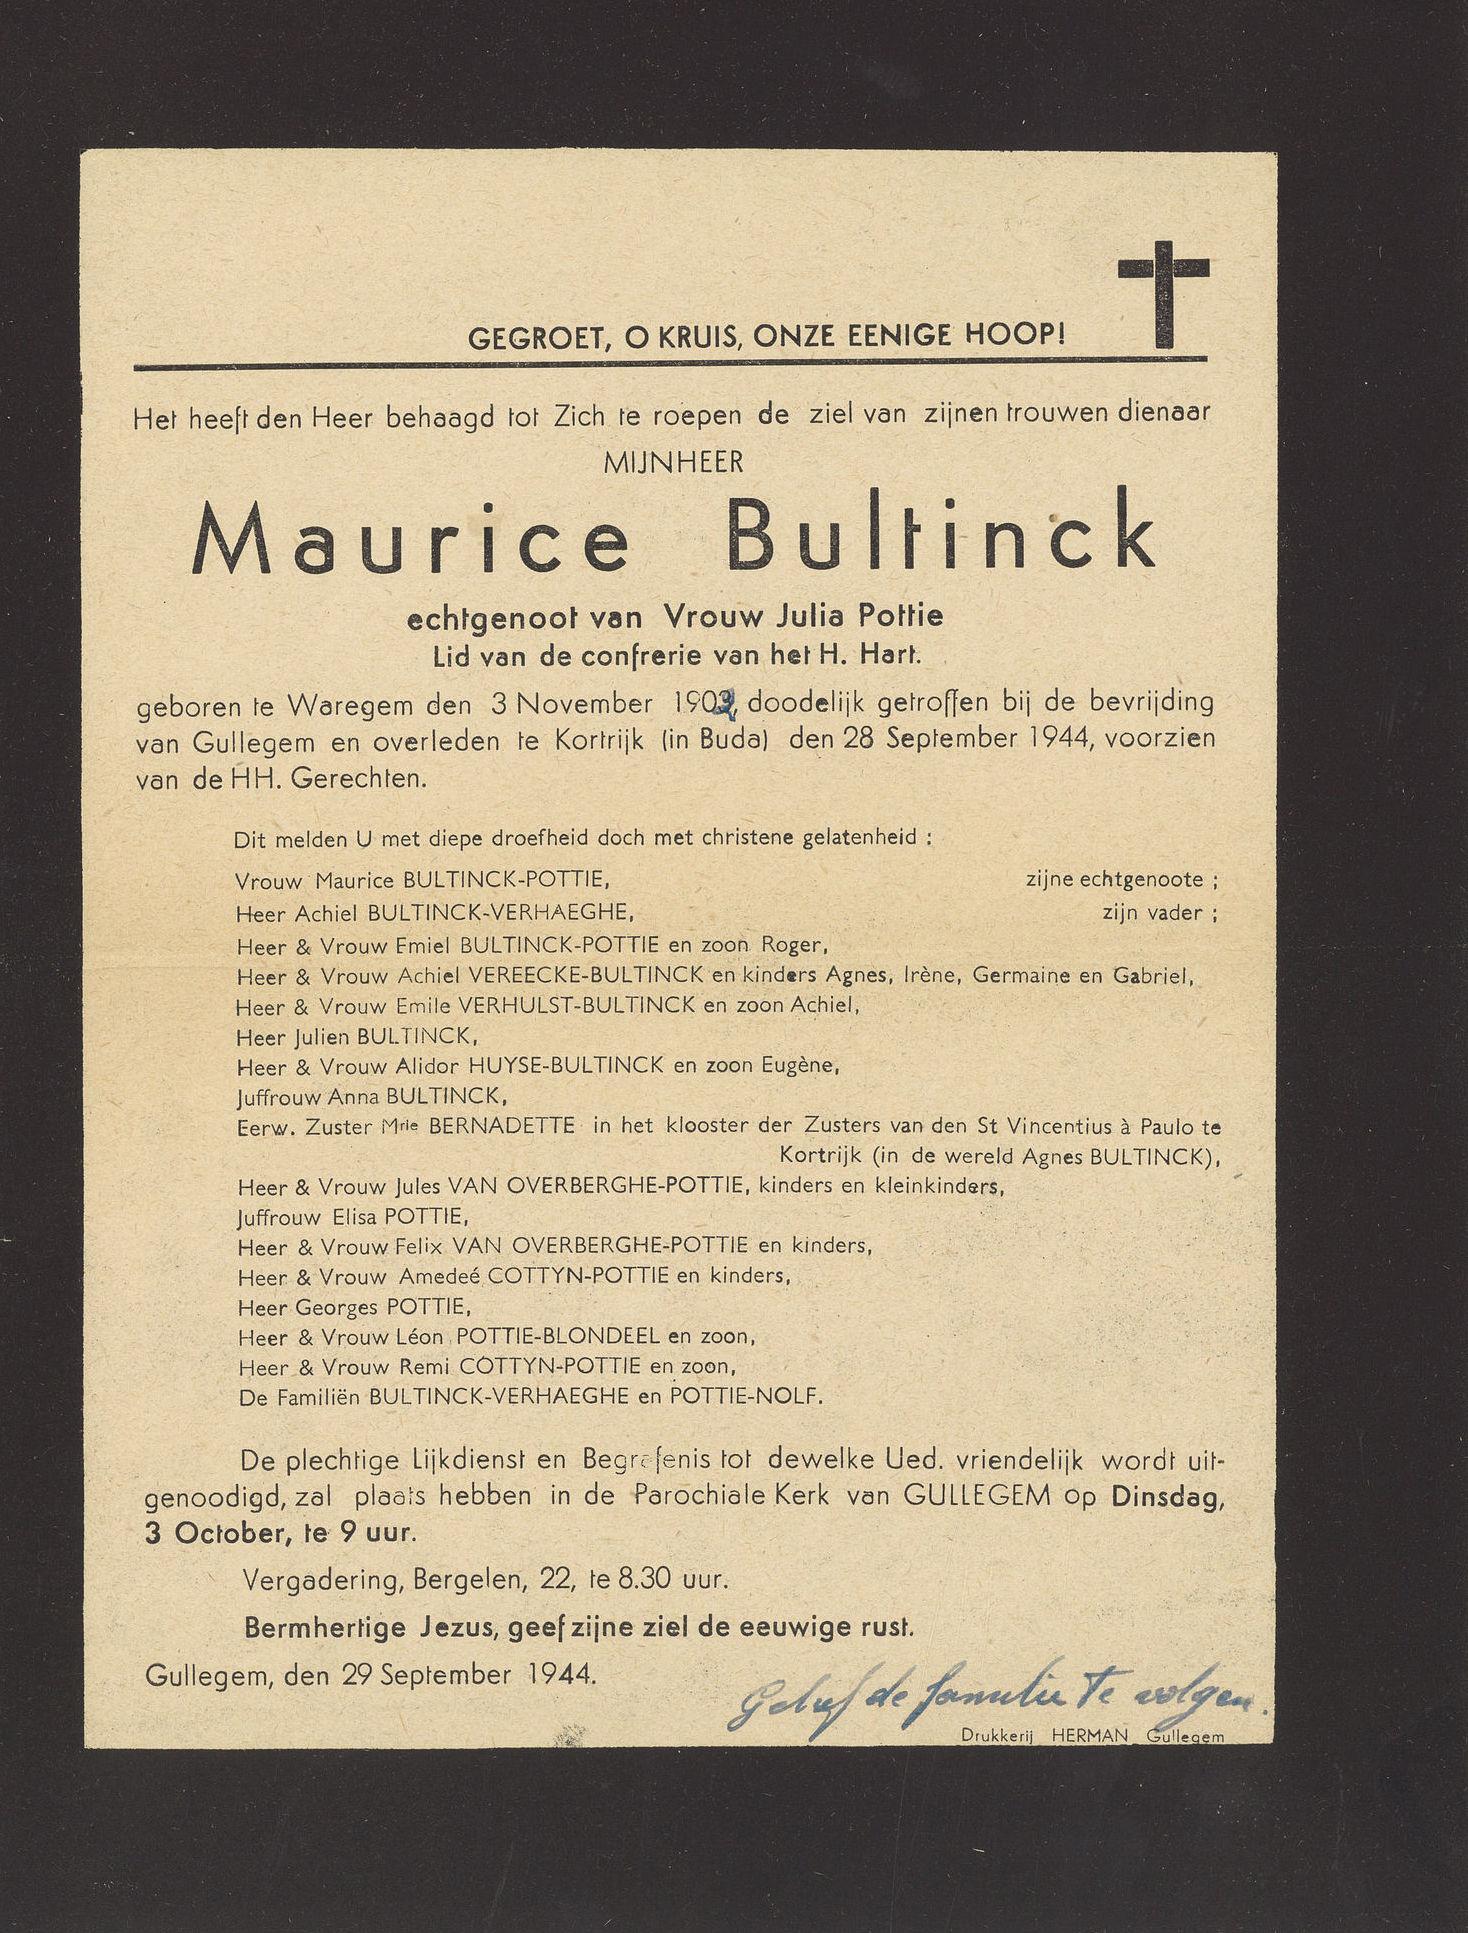 Maurice Bultinck